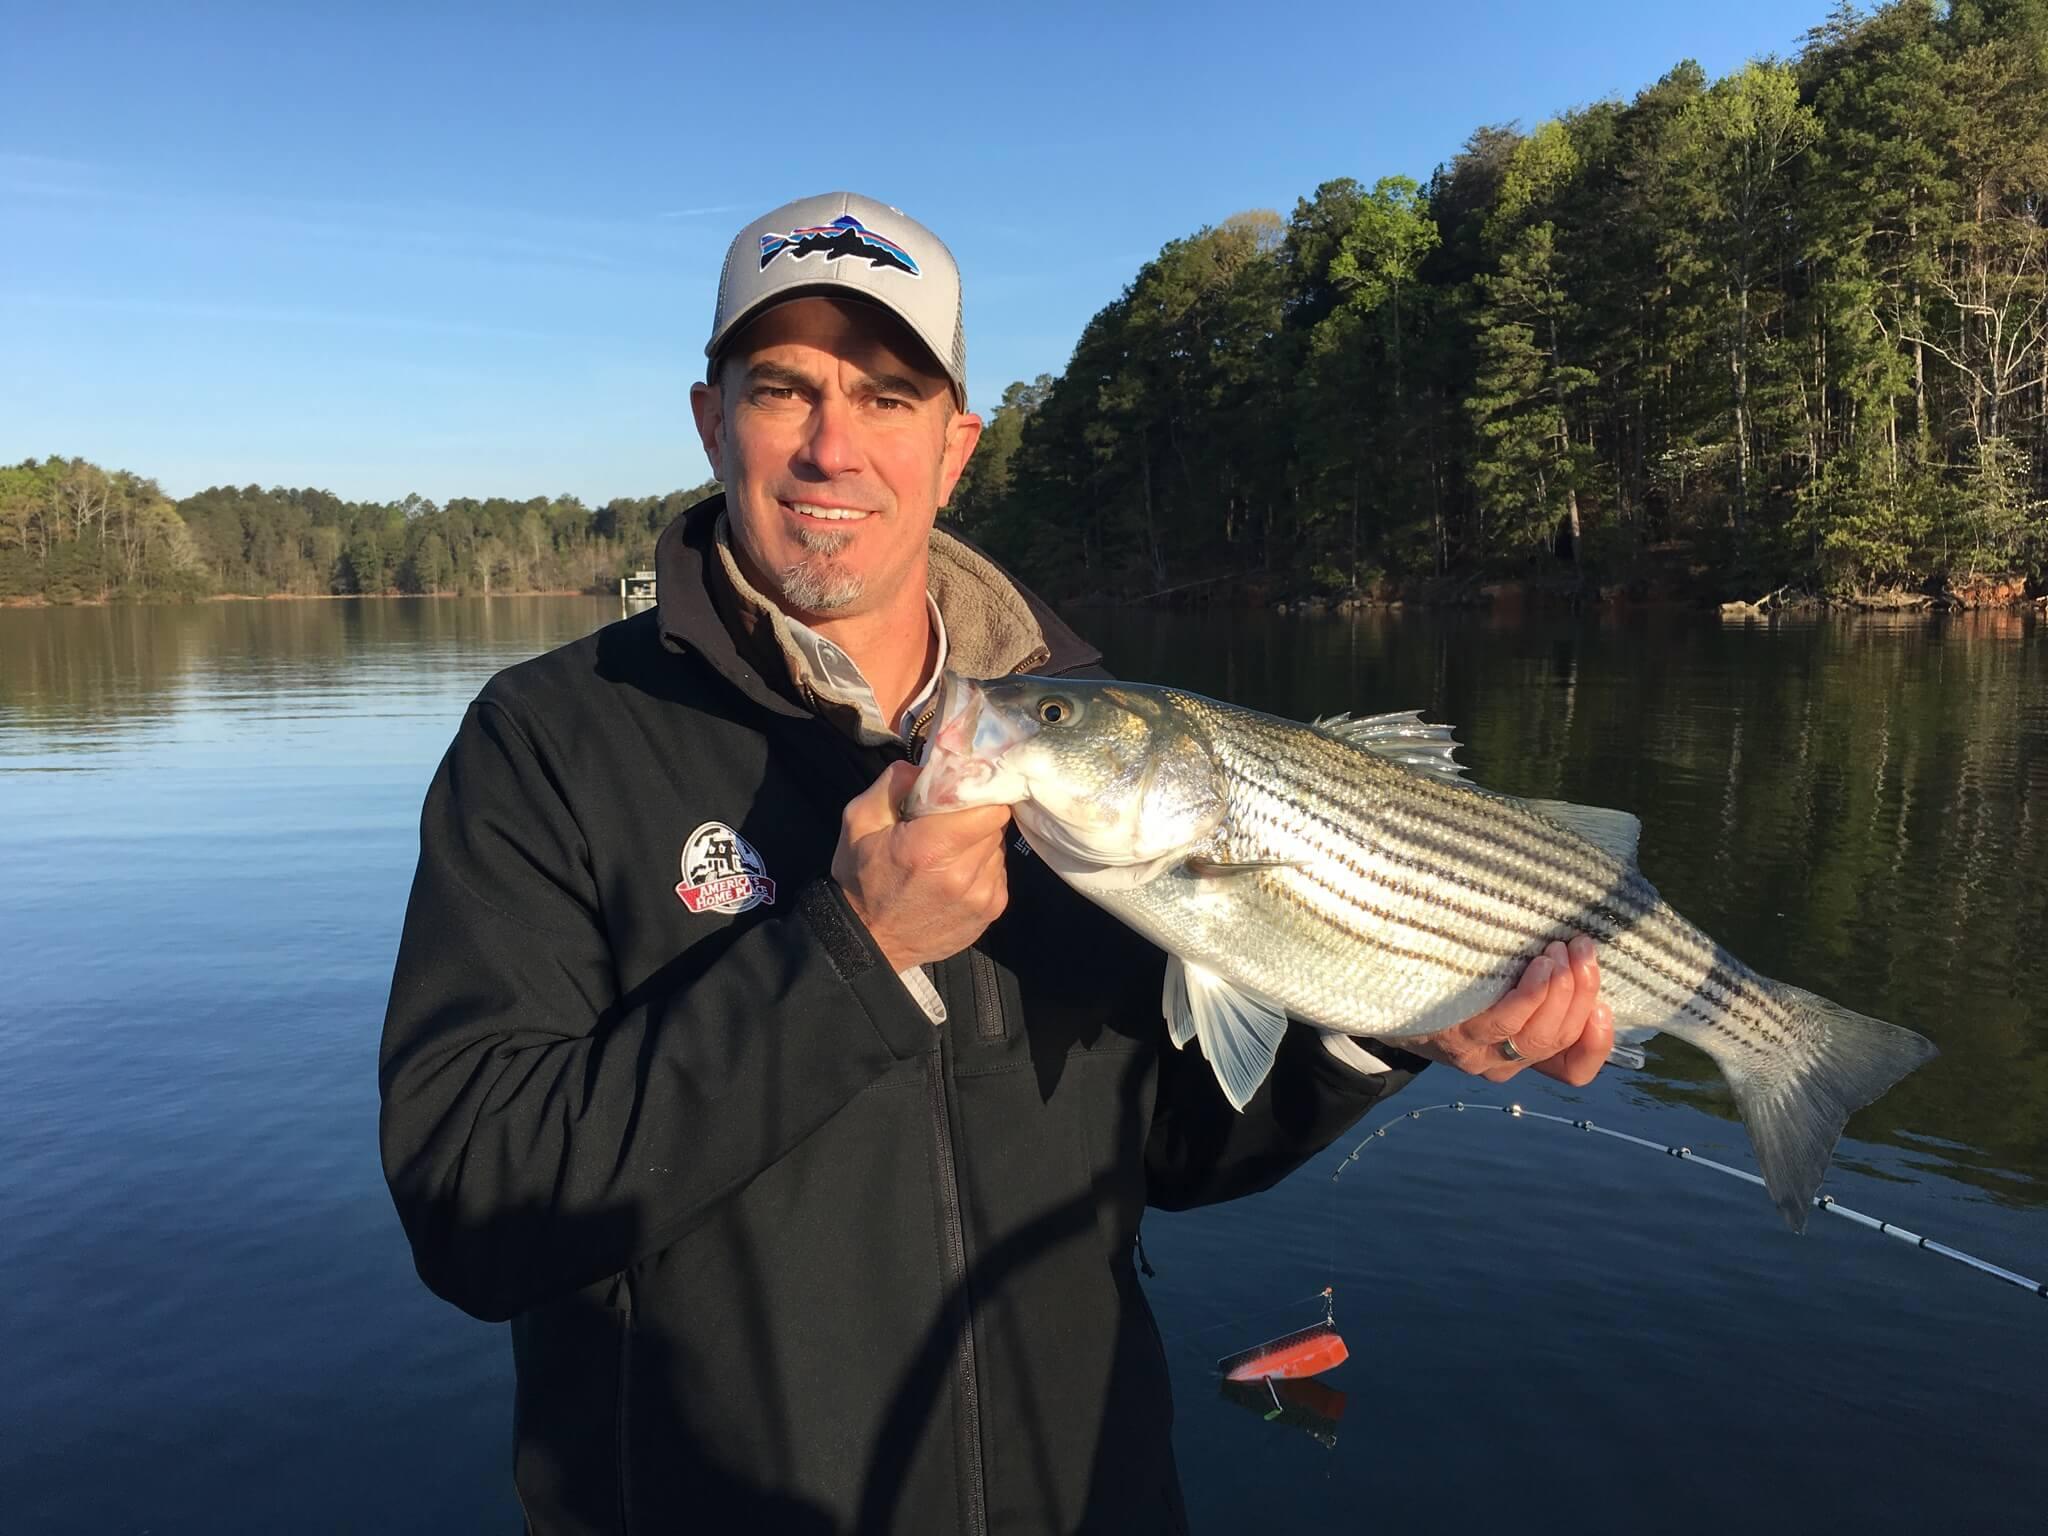 Lake lanier fishing report april 13 2018 captain mack 39 s for Fishing report lake lanier